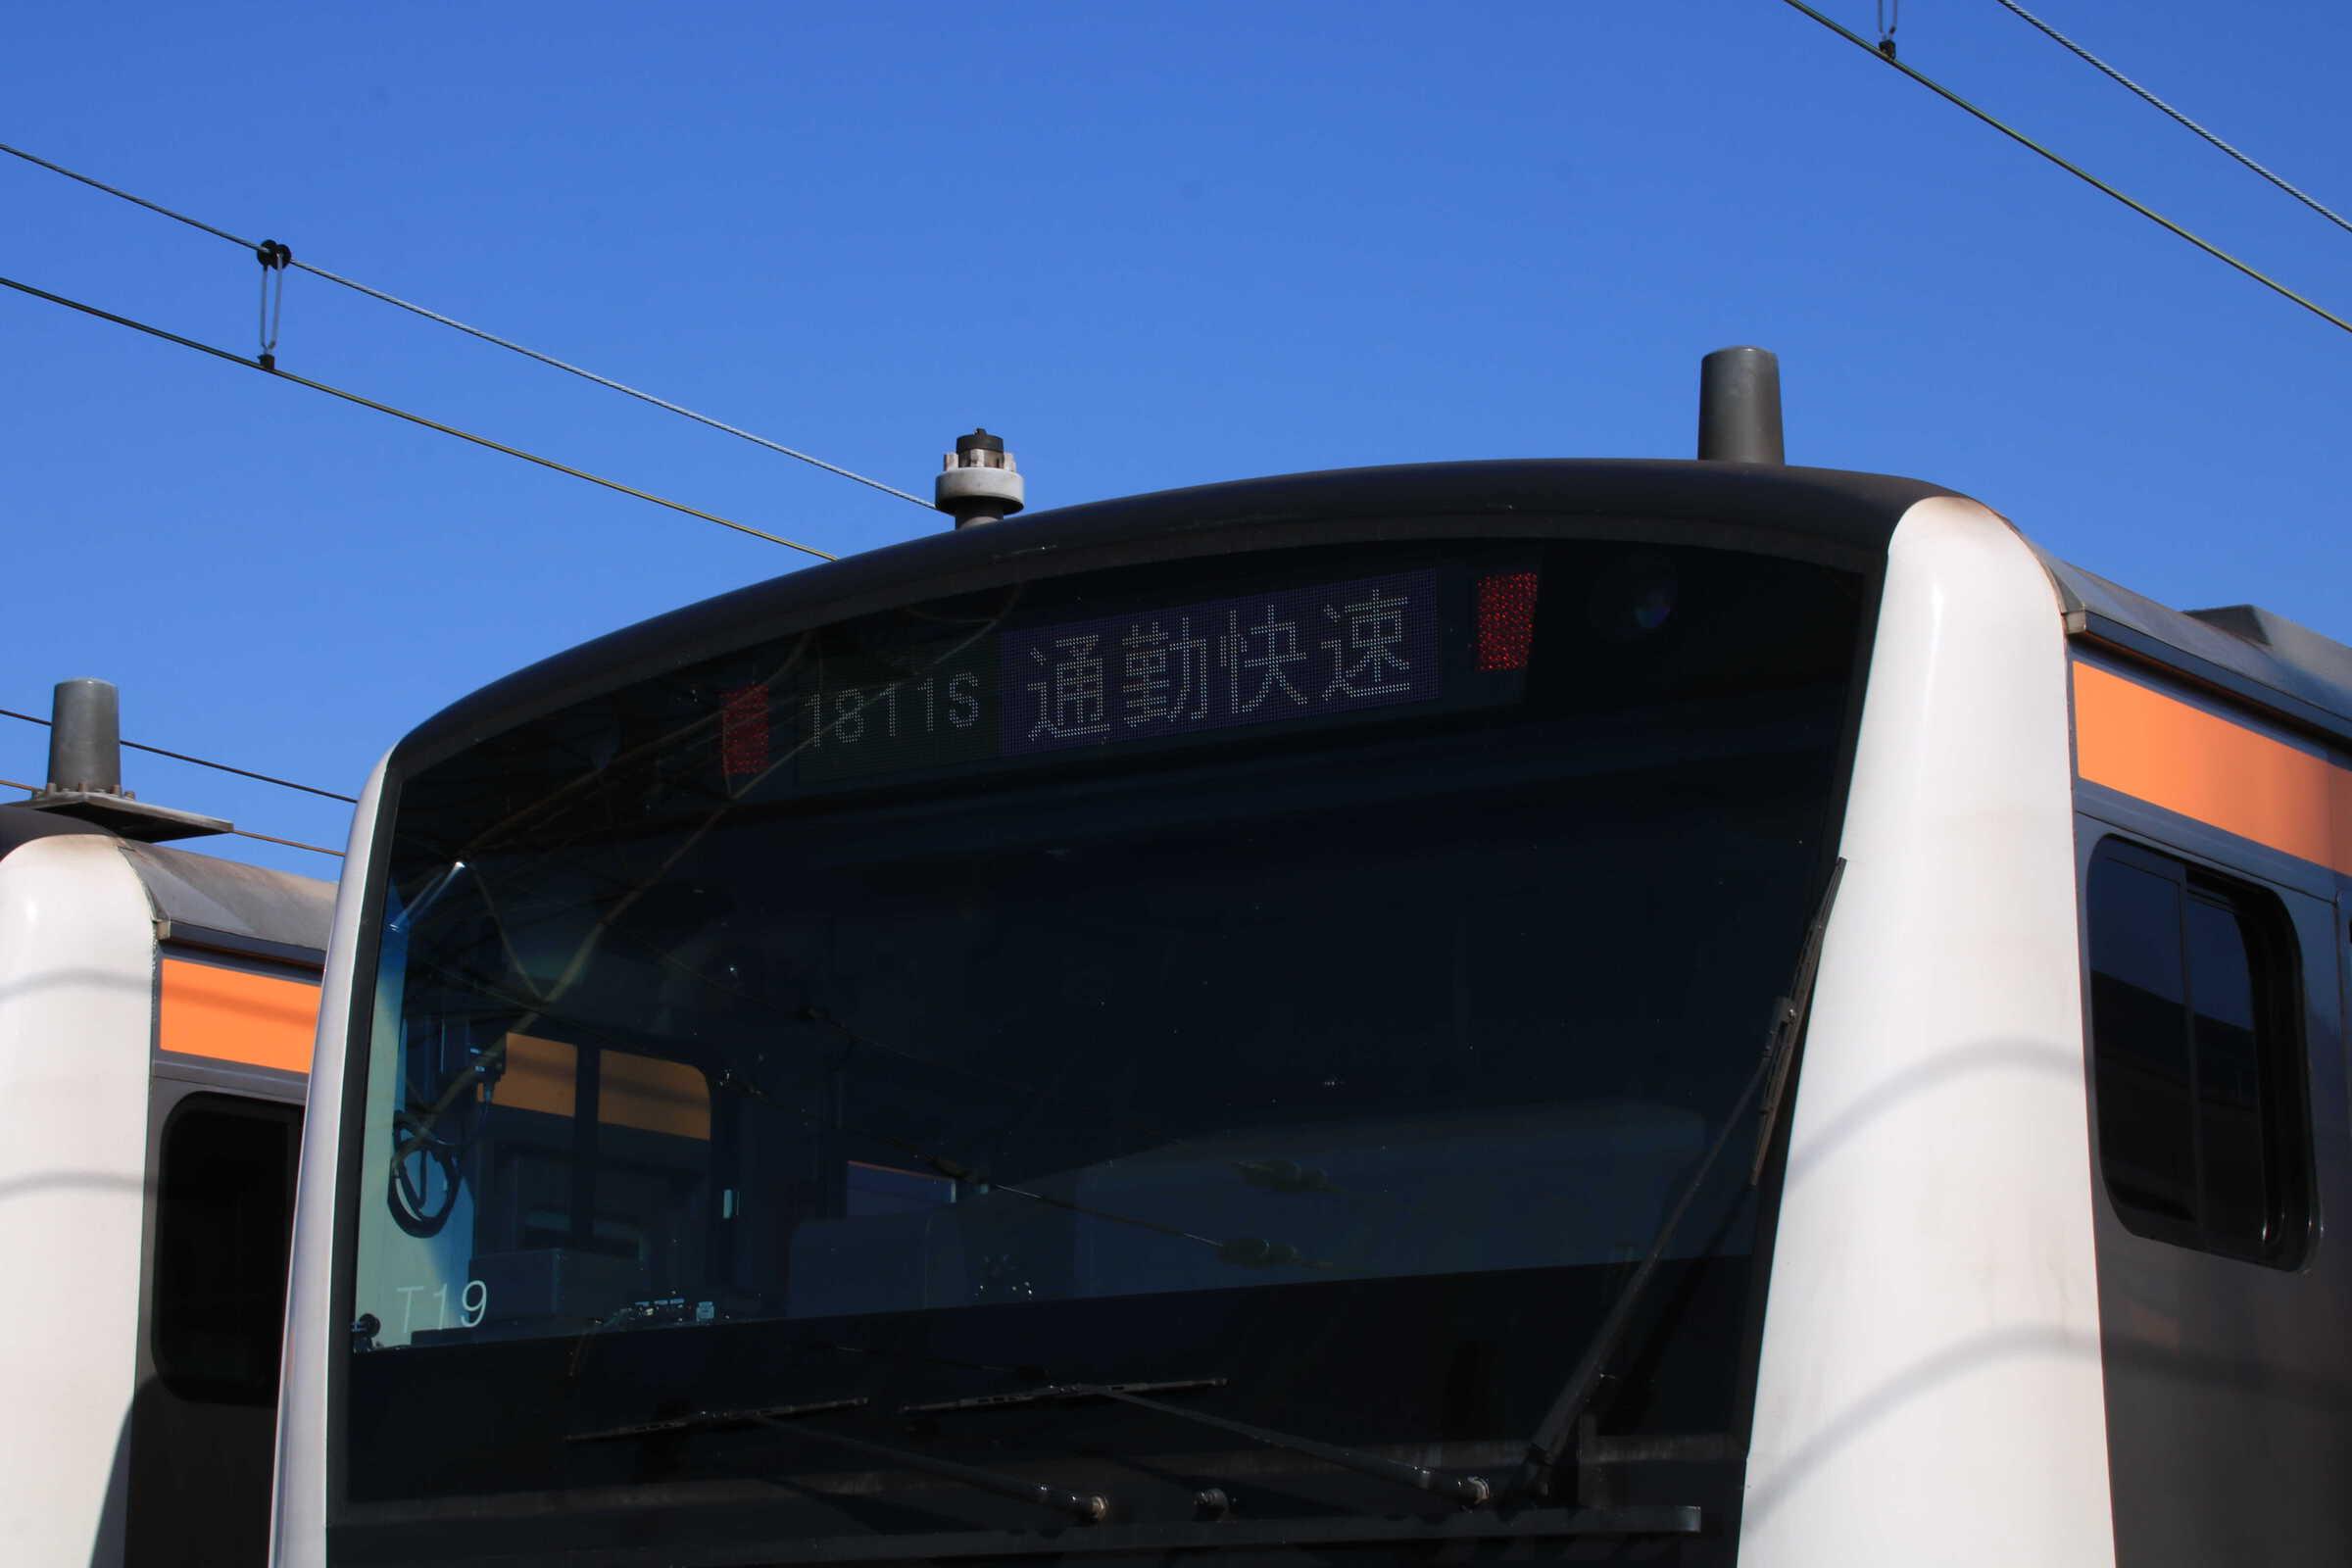 1811S 通勤快速 川越行き E233系 八トタT19編成